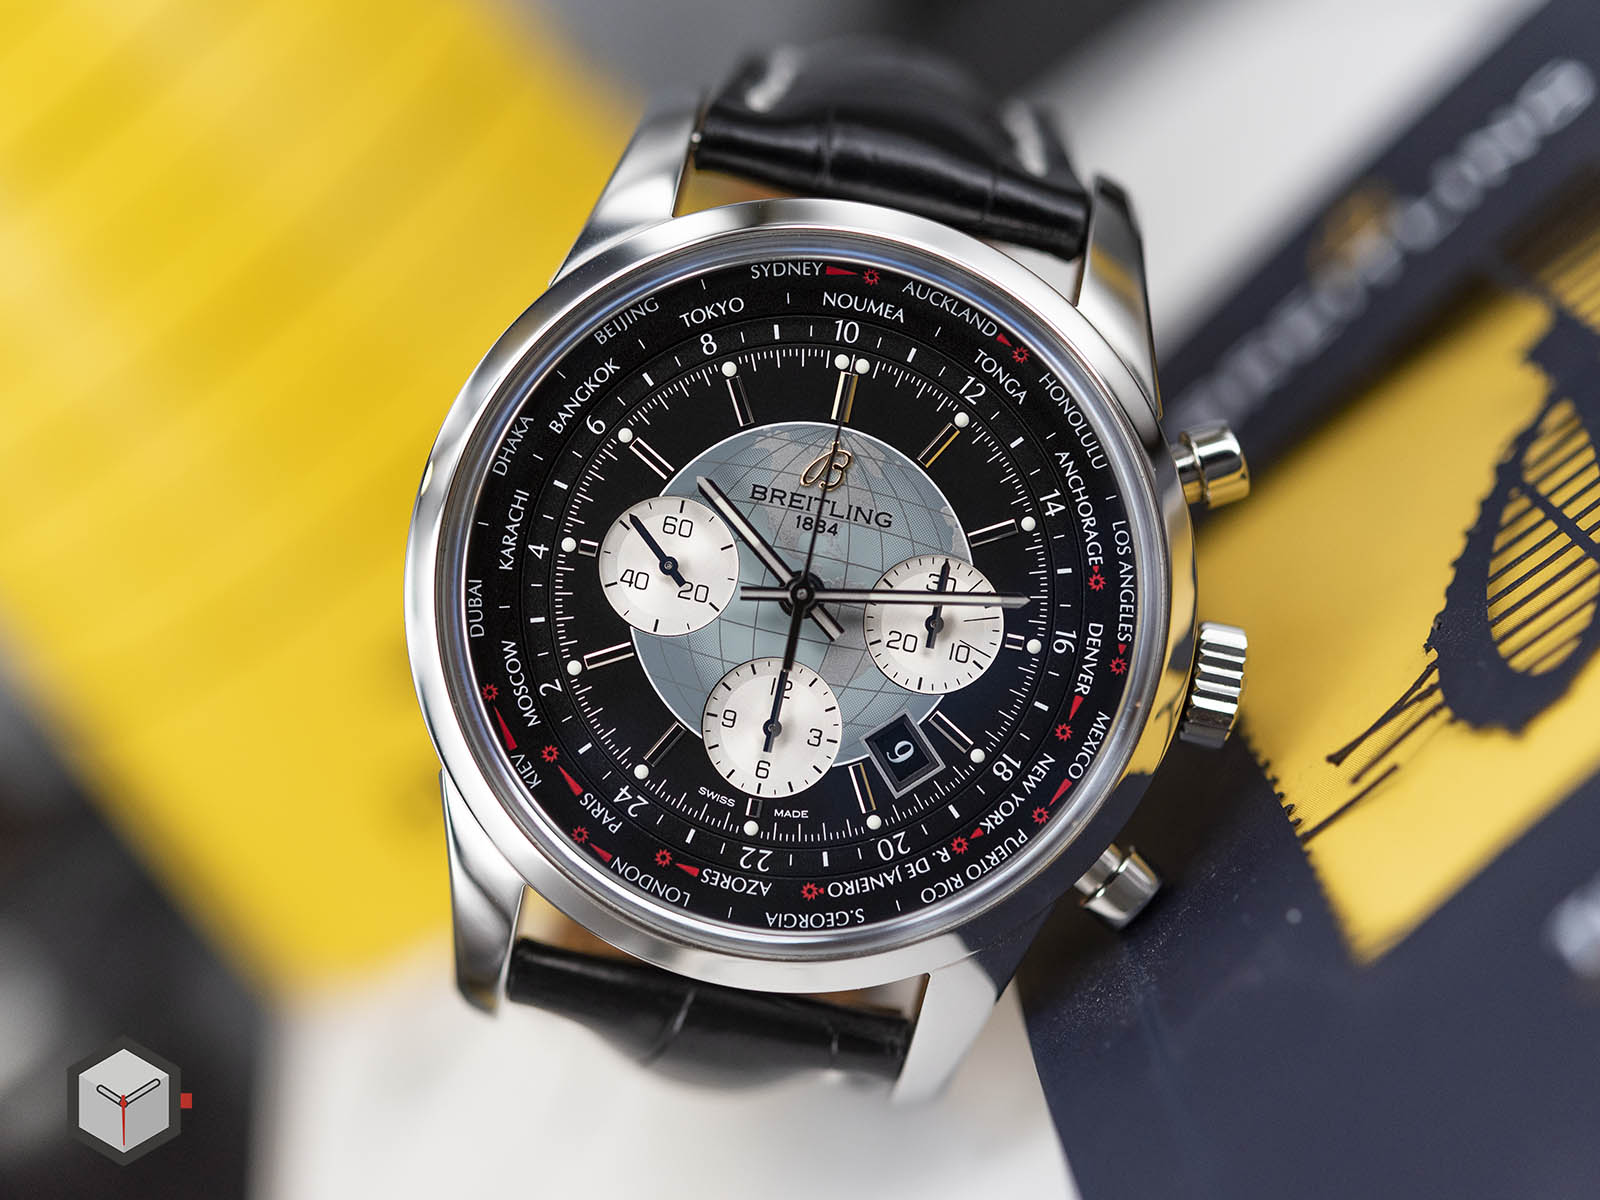 ab0510u4-bb62-760p-breitling-transocean-chronograph-unitime-4.jpg